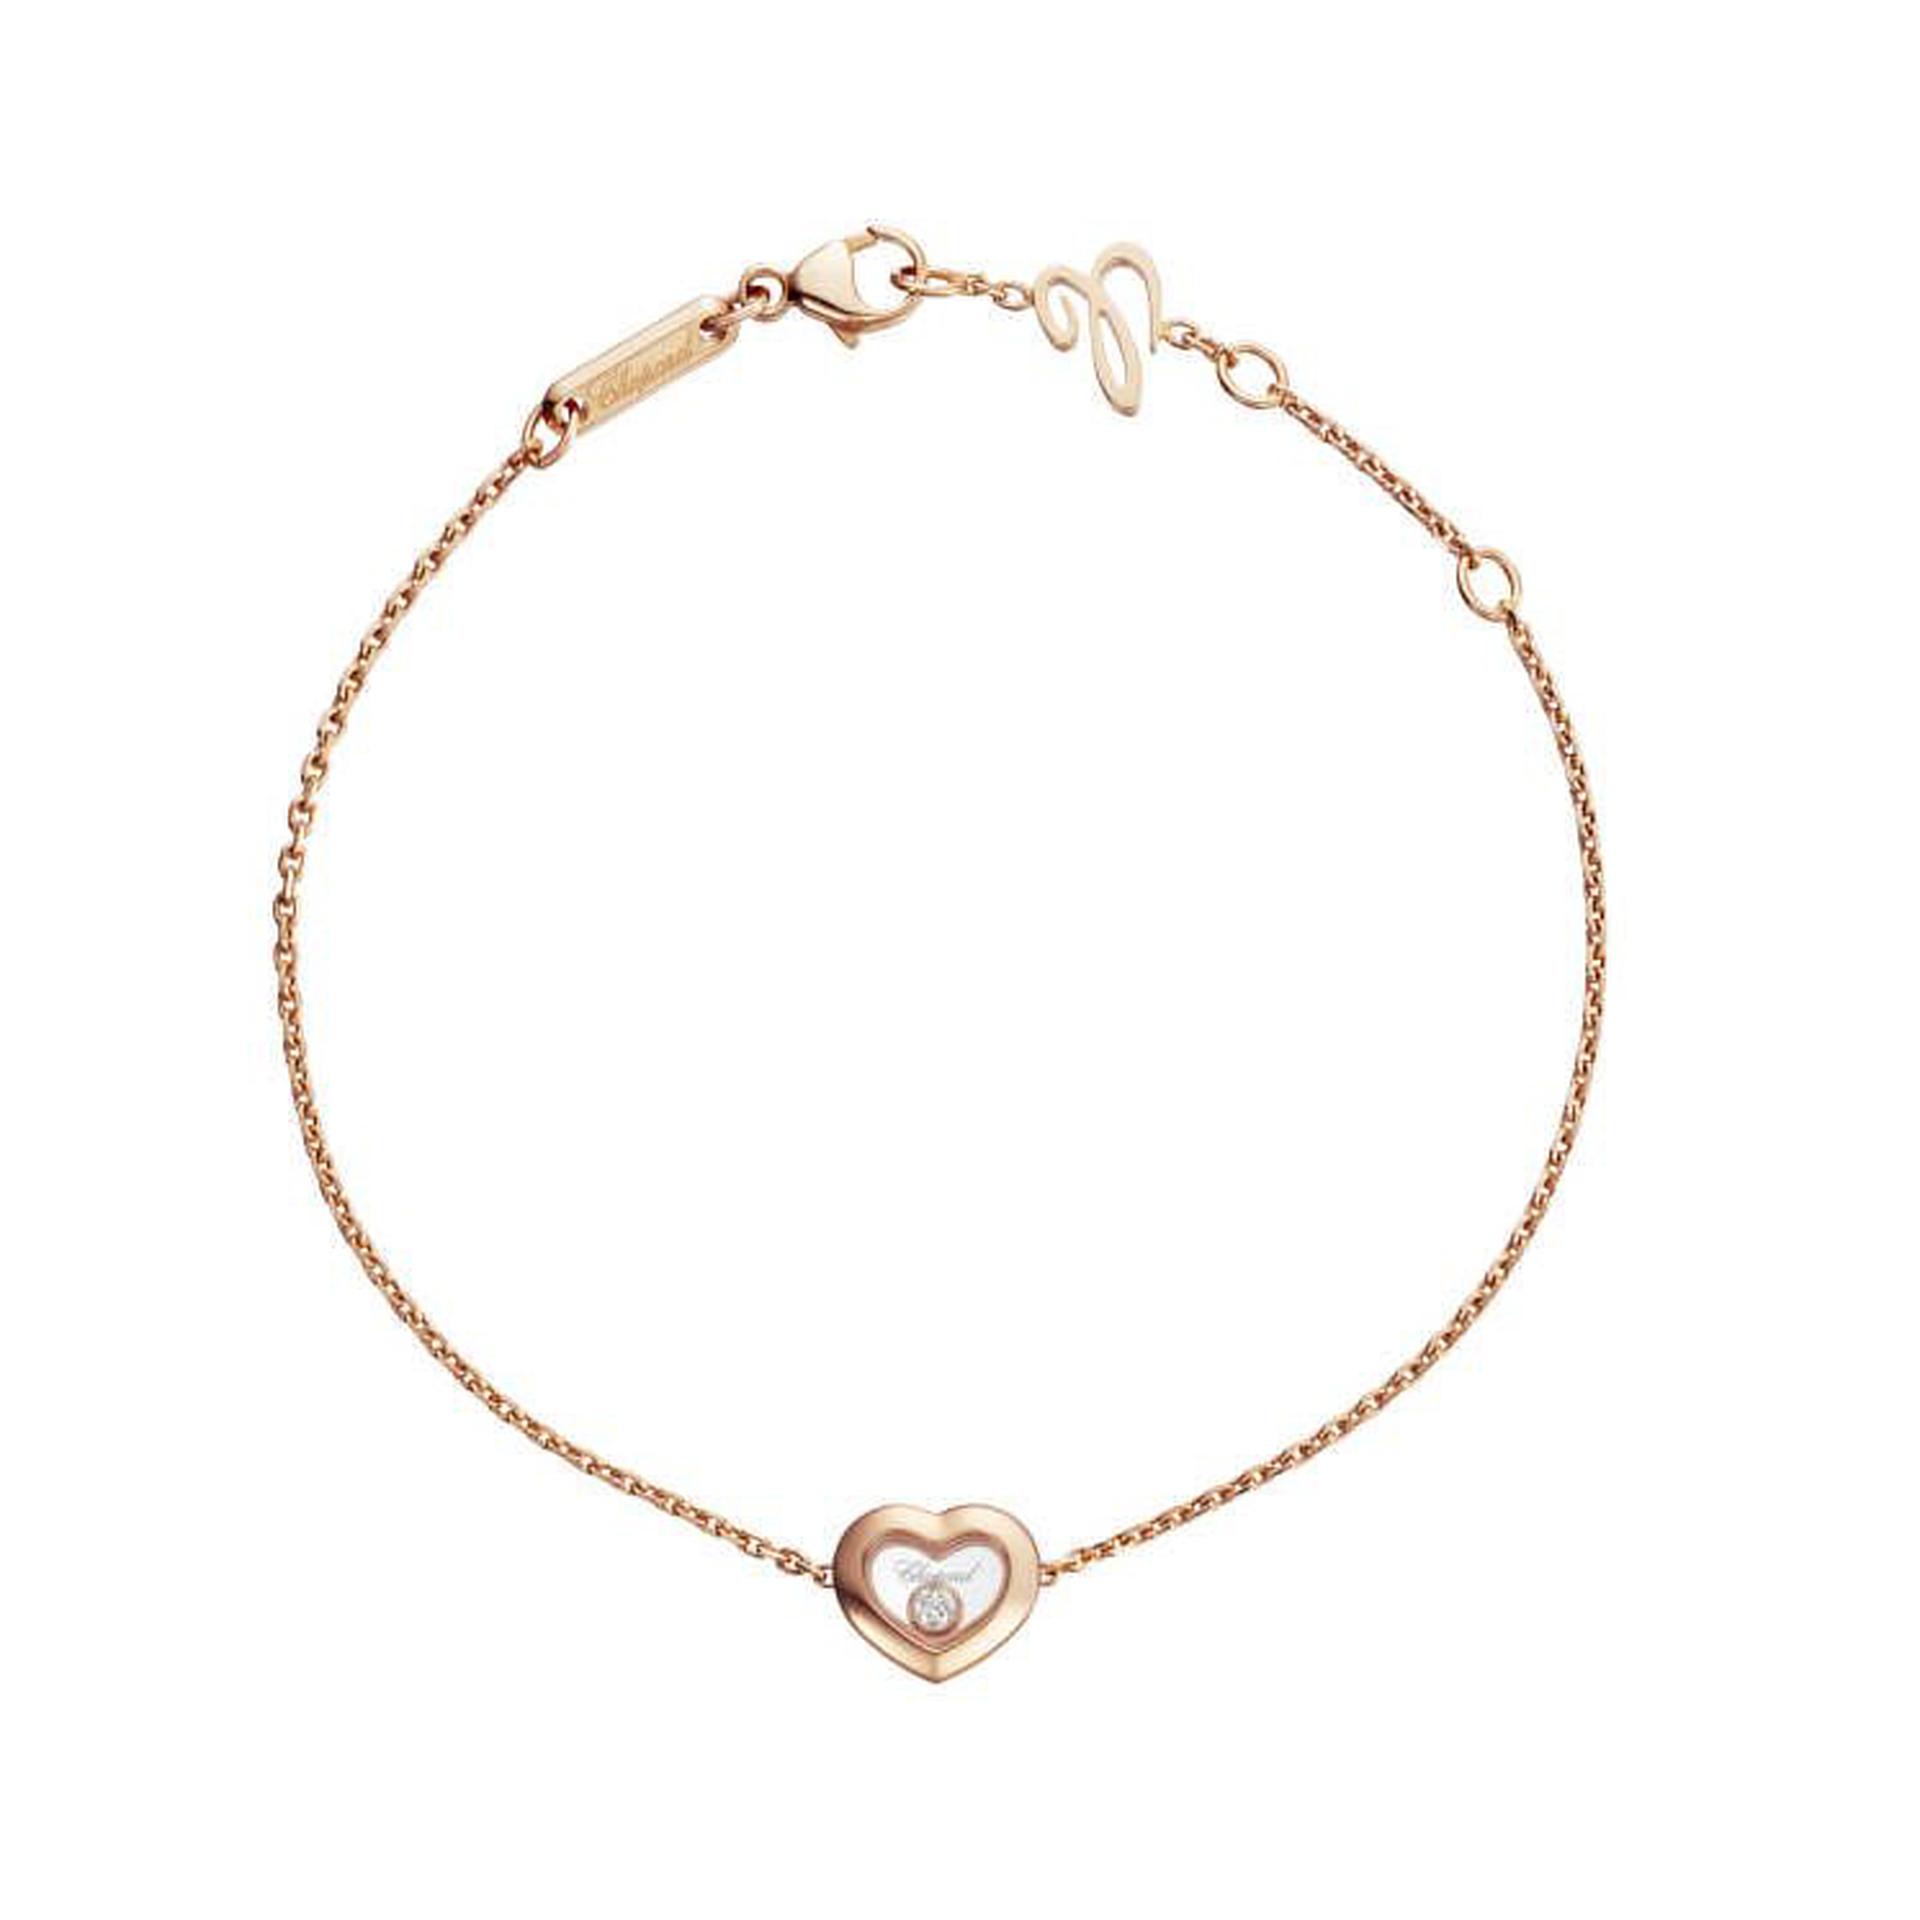 Chopard Happy Diamonds Heart Bracelet 18-carat Rose Gold and Diamonds